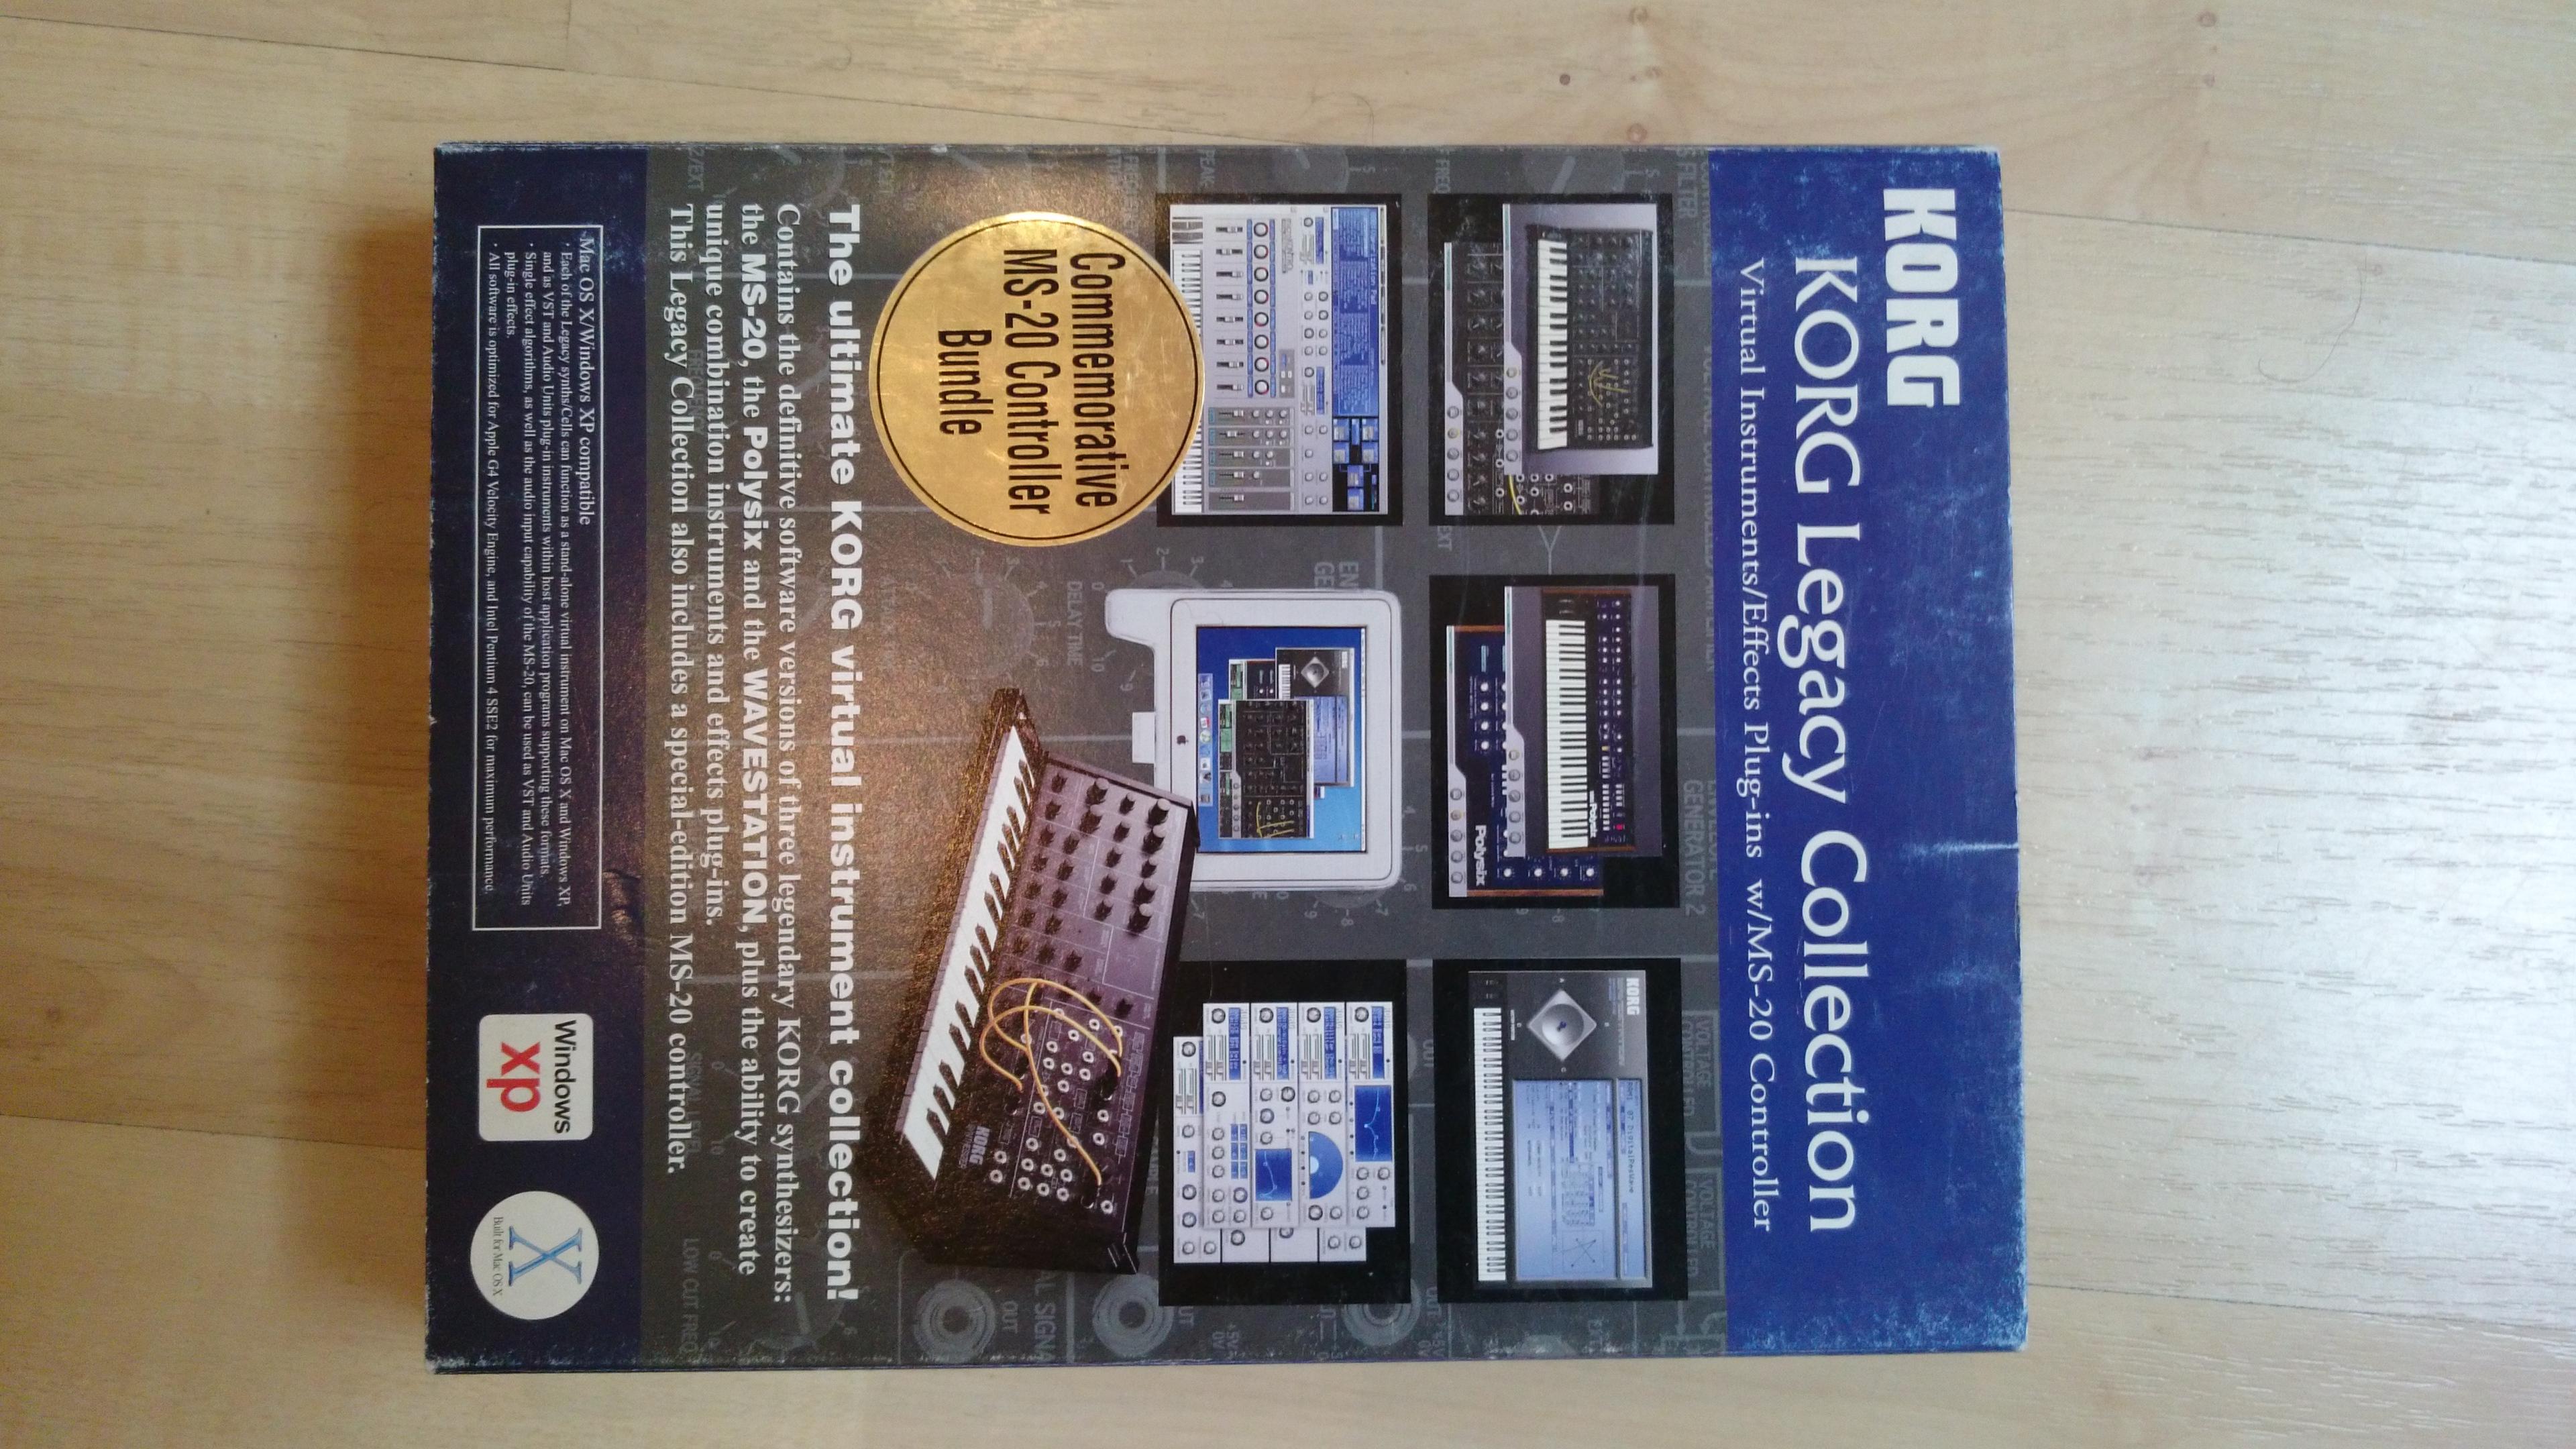 Armin van buuren's korg legacy collection (analog edition.